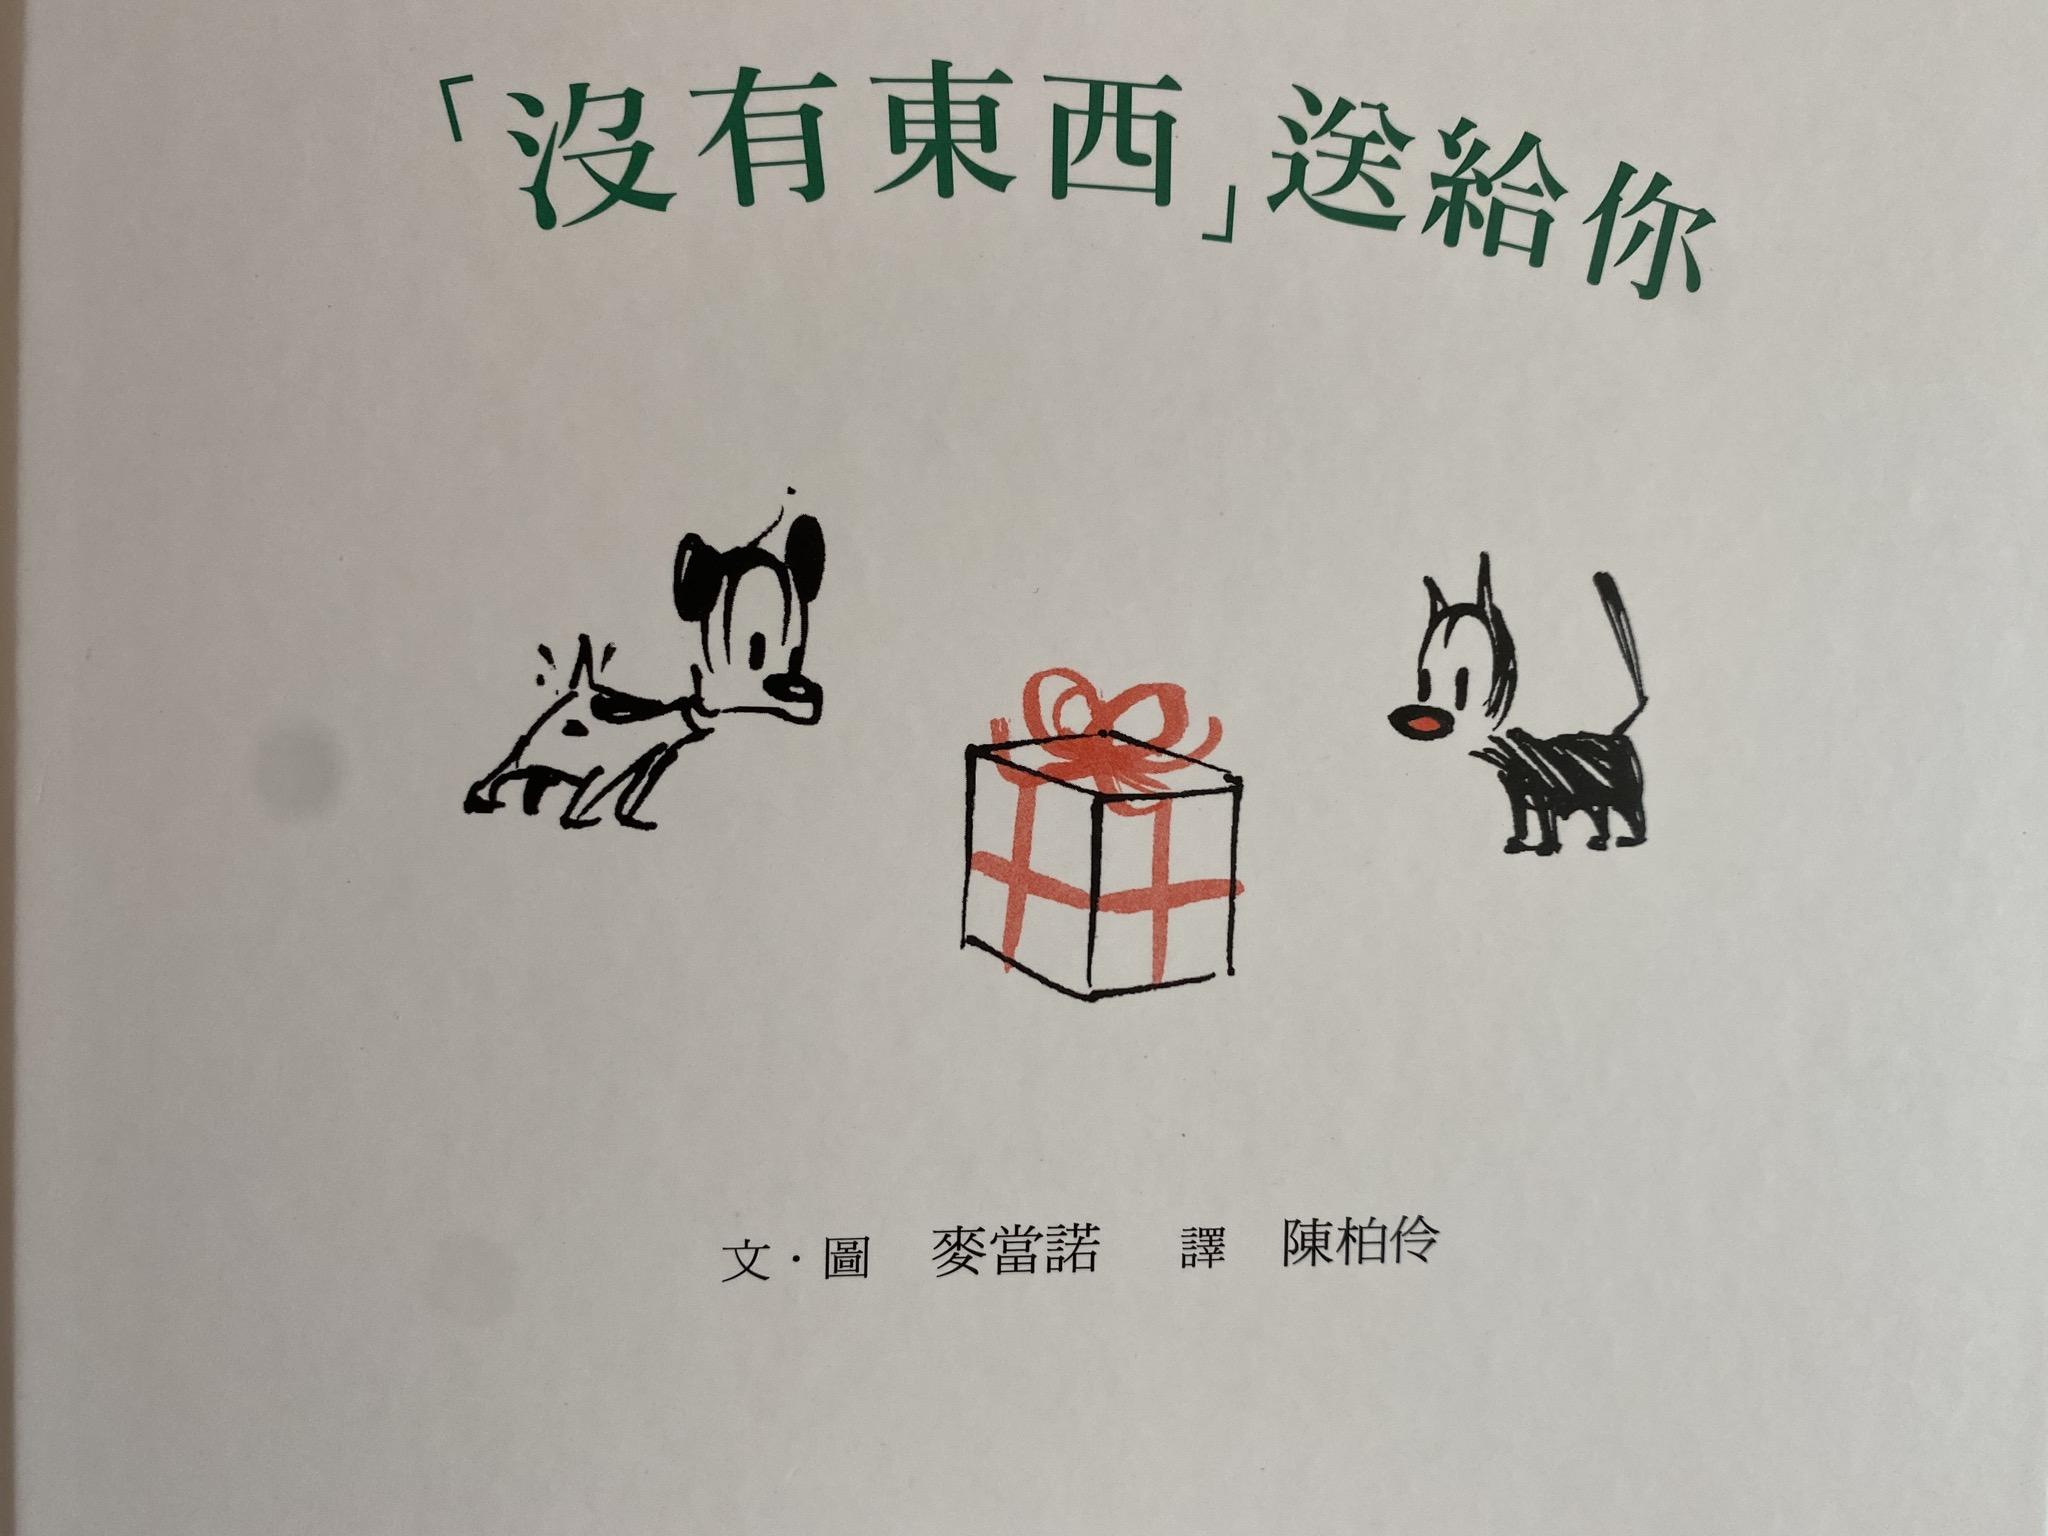 S2-021/「沒有東西」送給你/ 麥當諾/ 陳柏伶/ 格林出版社